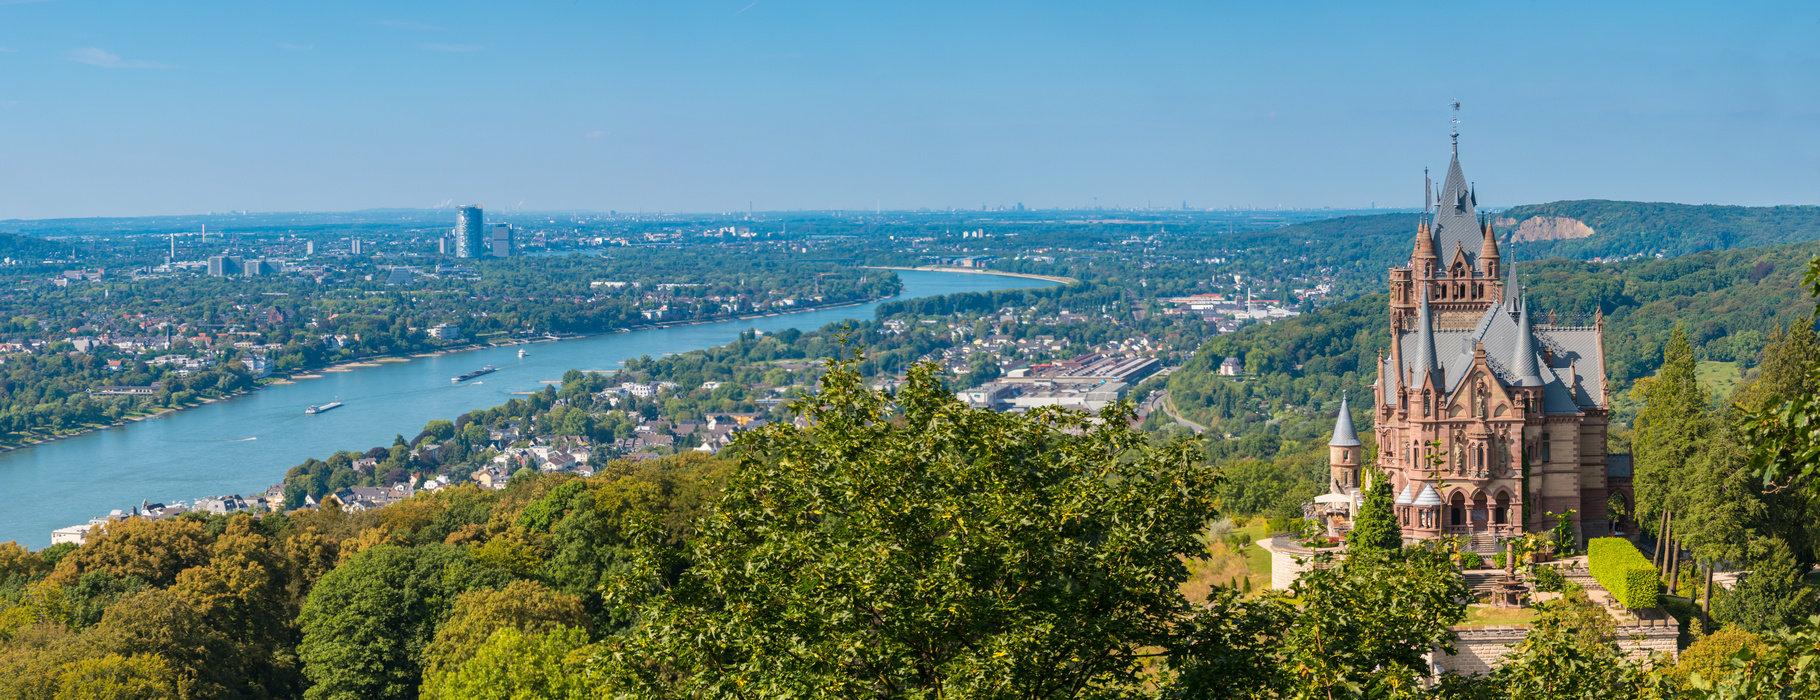 schloss-drachenburg-bonn-panorama